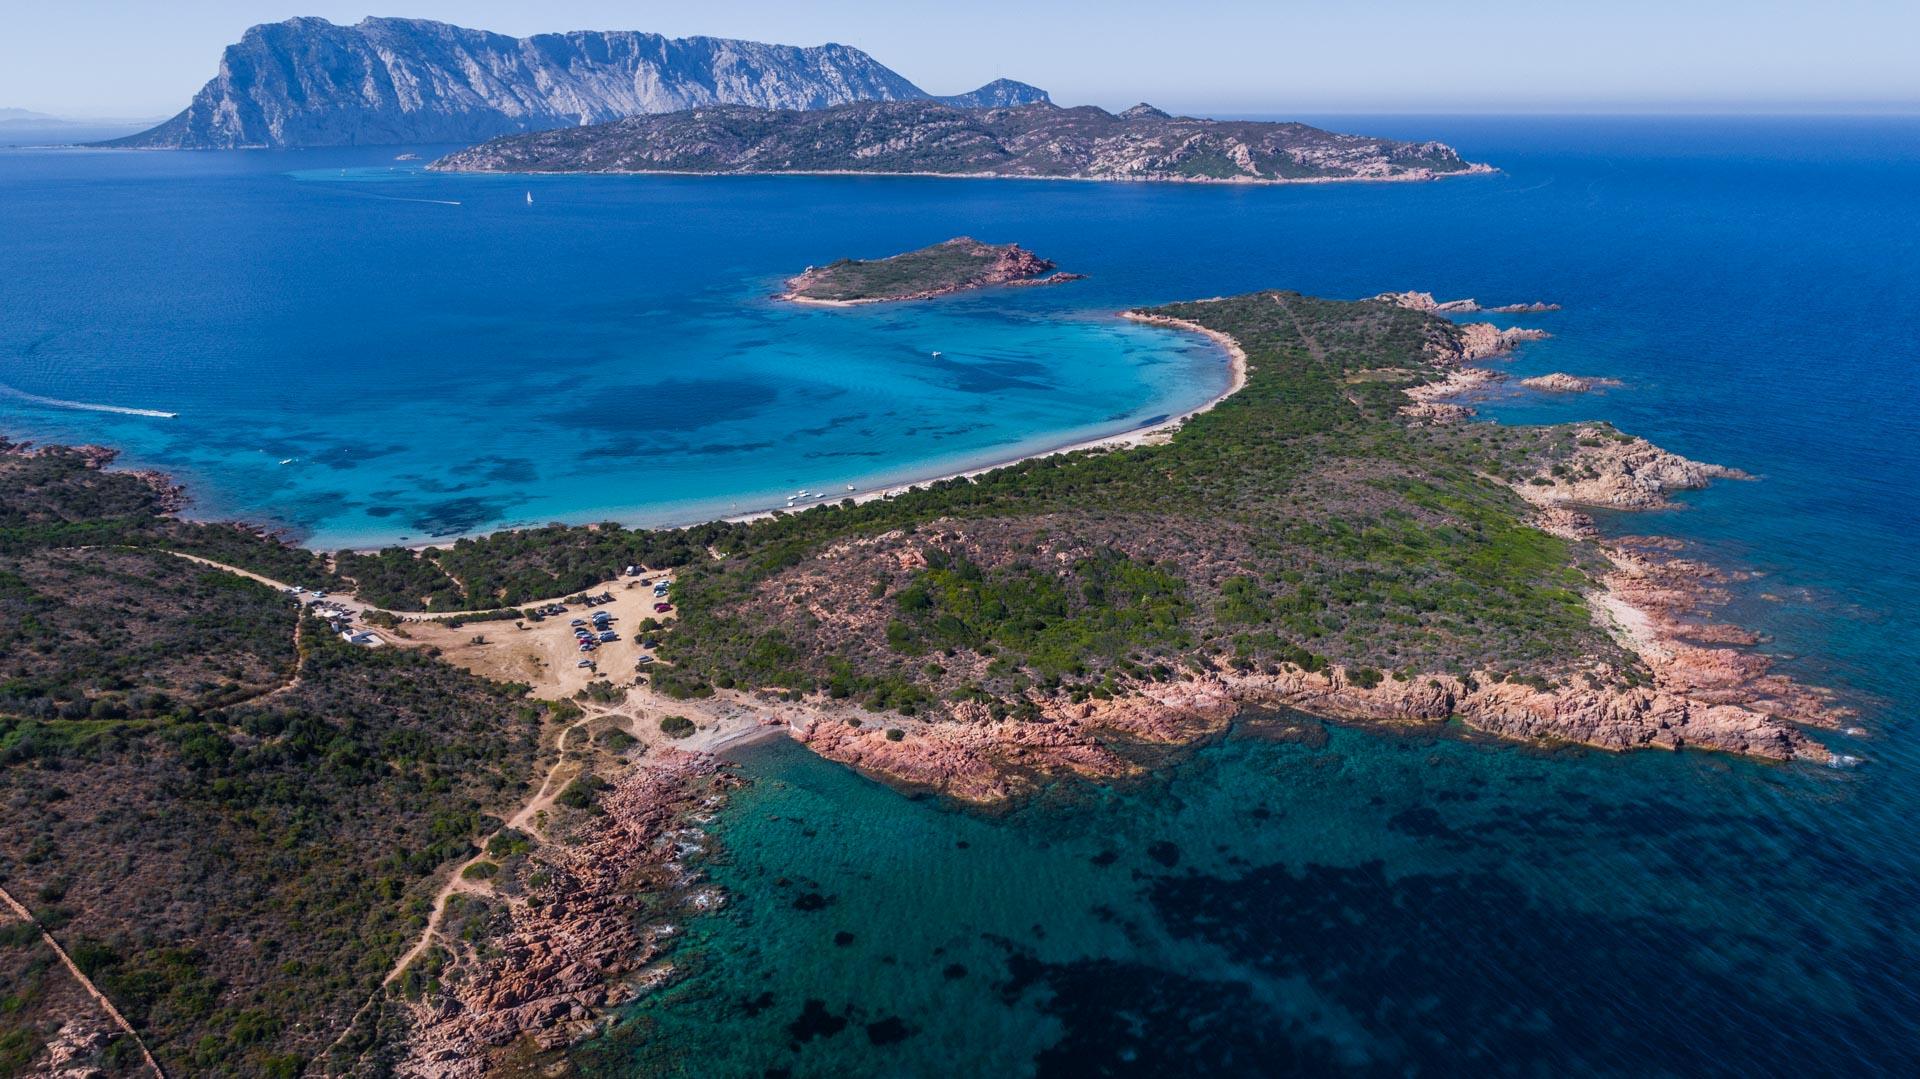 Spiaggia di Punta Est Sardinia Aerial Photography drone Enrico Pescantini